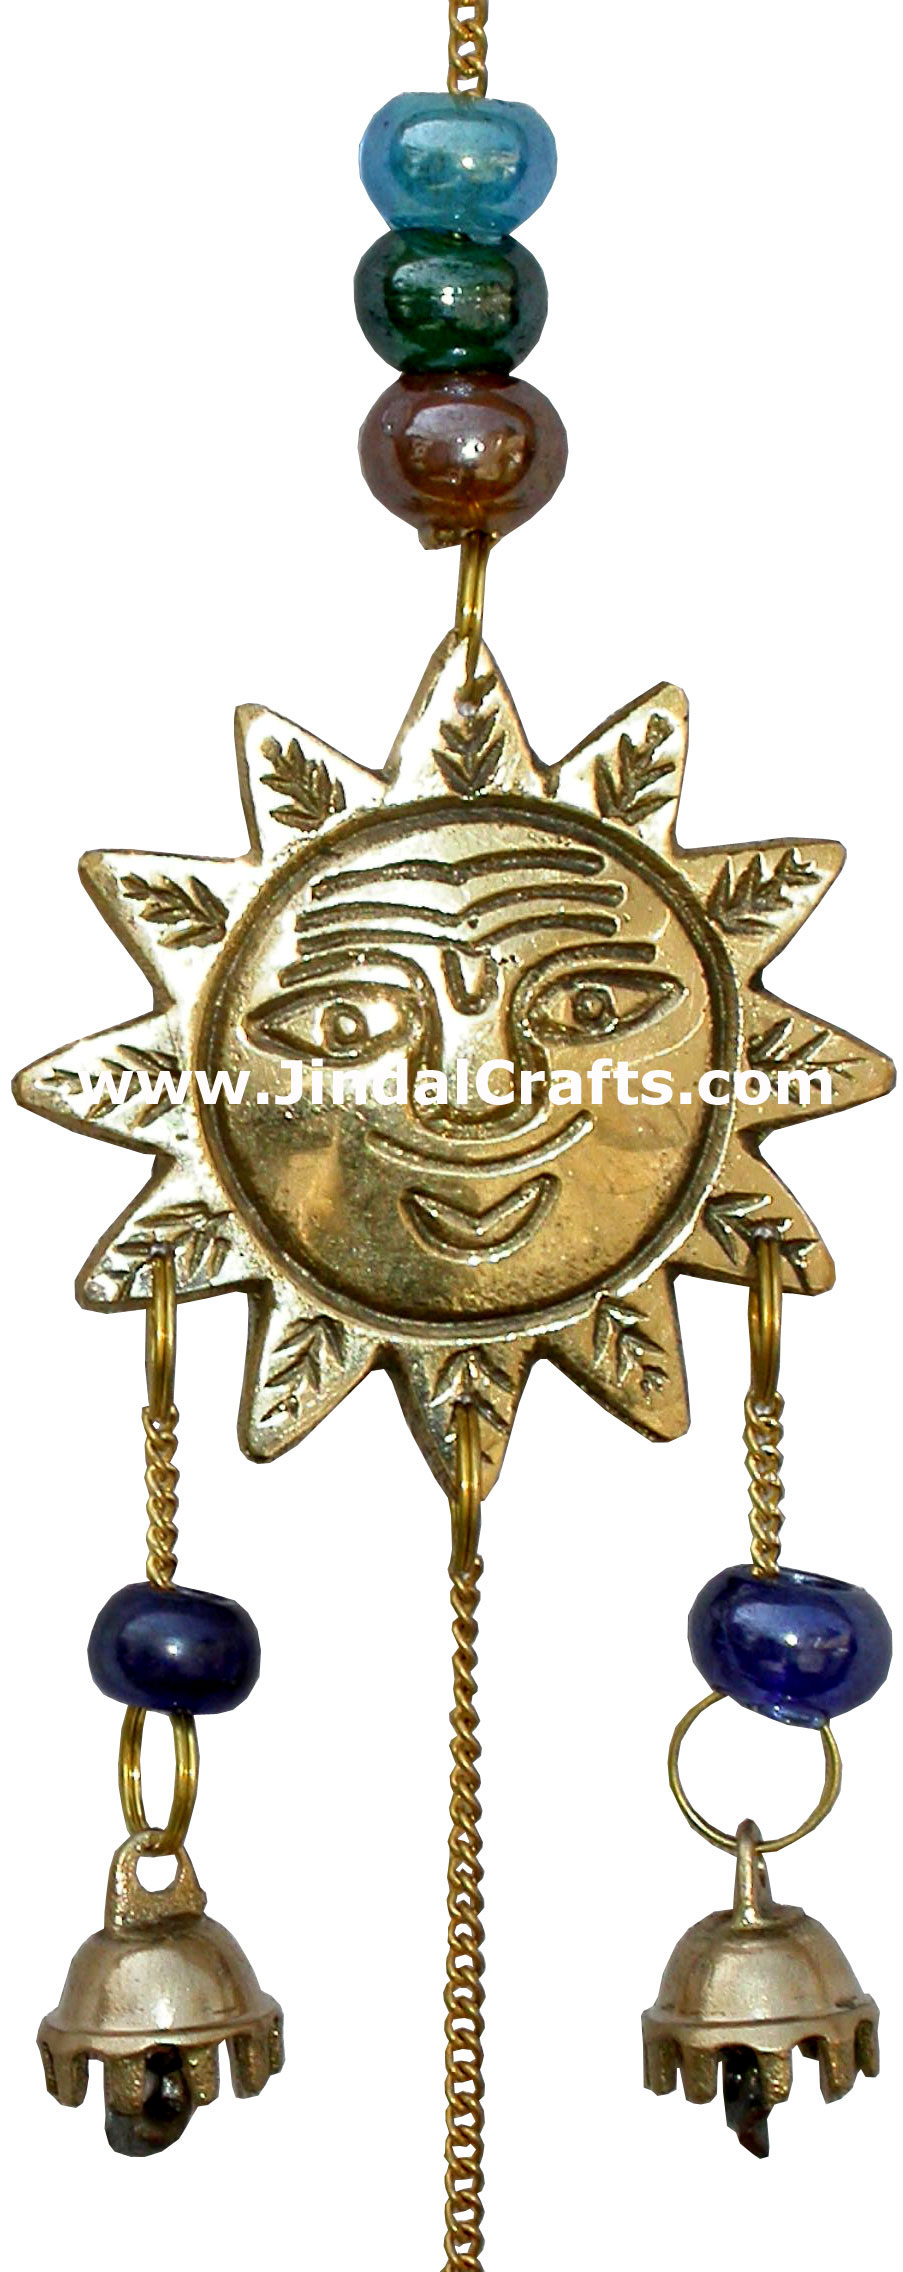 Brass Made Good Luck Home Decor Sun Moon Star Wind Chimes